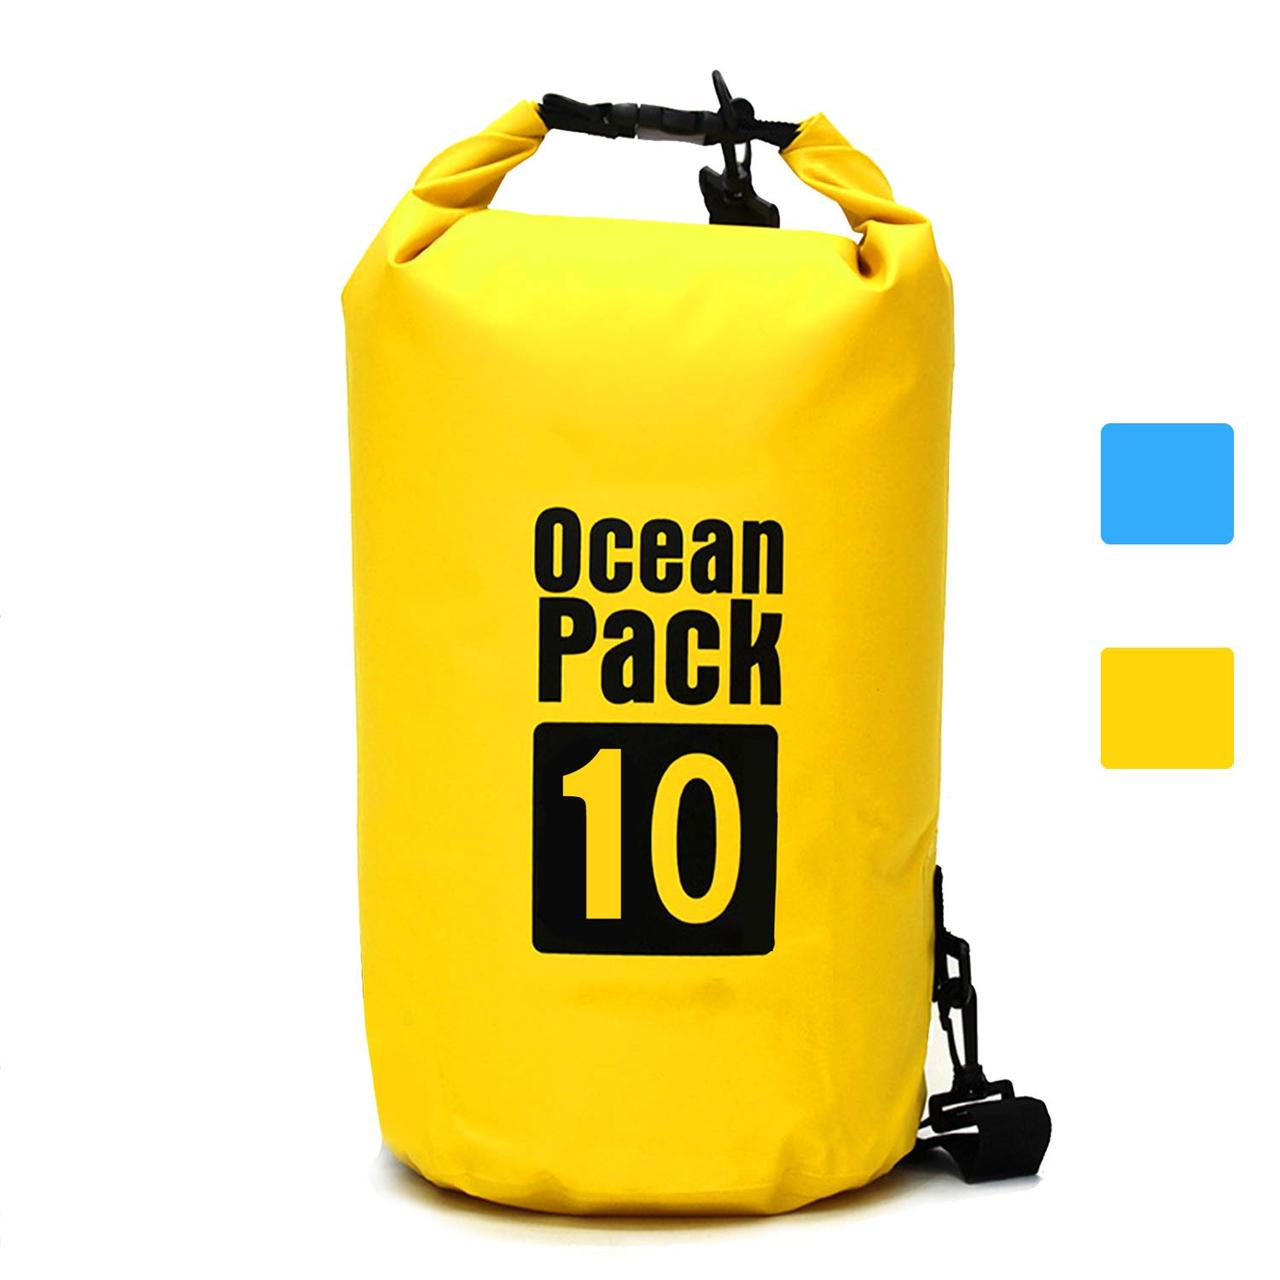 Водонепроницаемая сухая сумка-рюкзак 10 L для плавания на байдарках каякинг кемпинг желтая